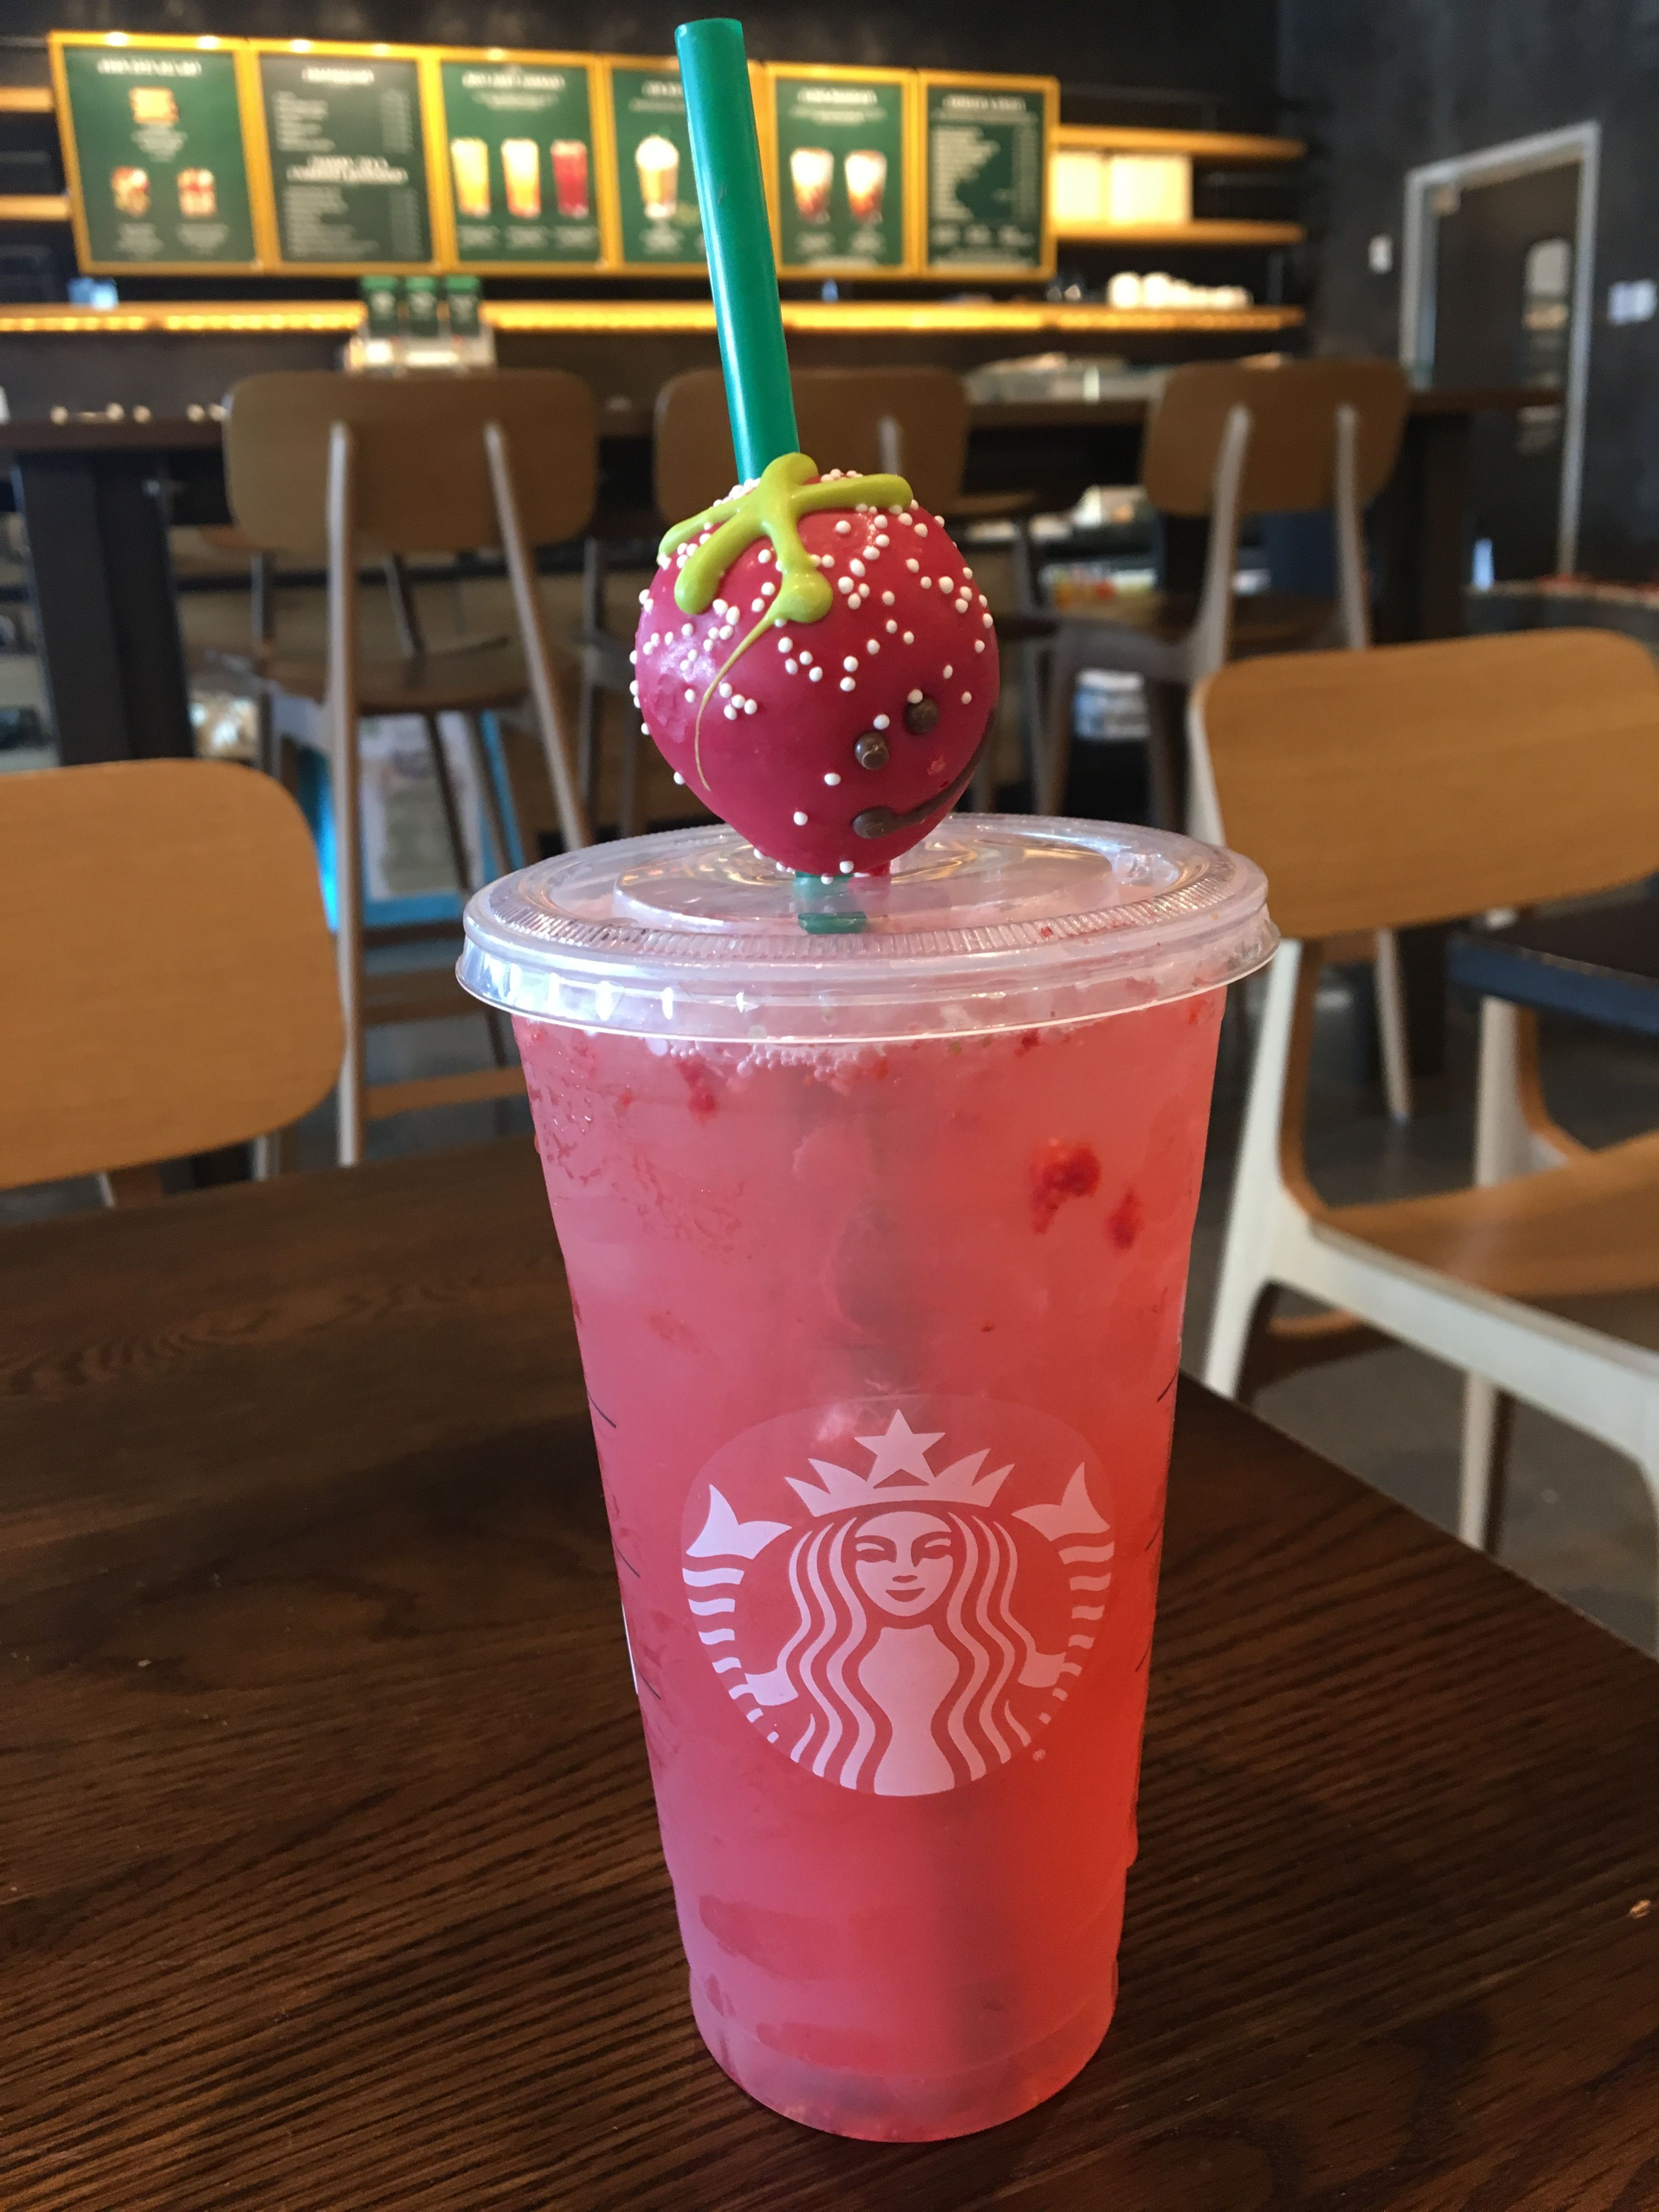 Pin De Nataliamoscoso En Gato Bebidas De Starbucks Starbucks Fondo De Pantalla Iphone Disney